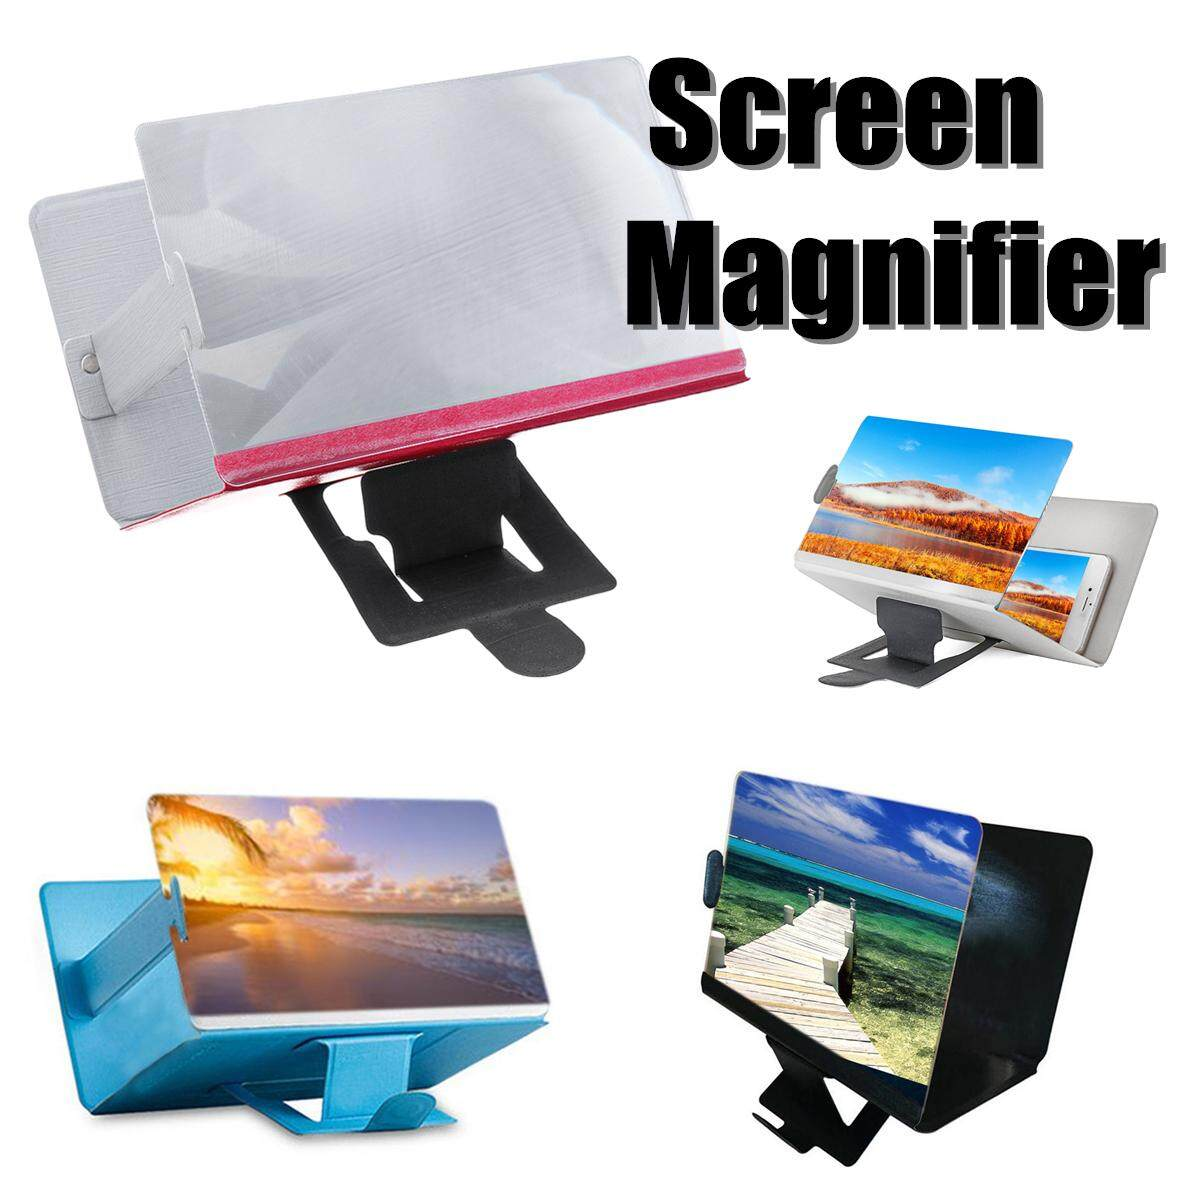 Support Screen Magnifier,Phone 3D HD Movie Video Amplifier,Pink